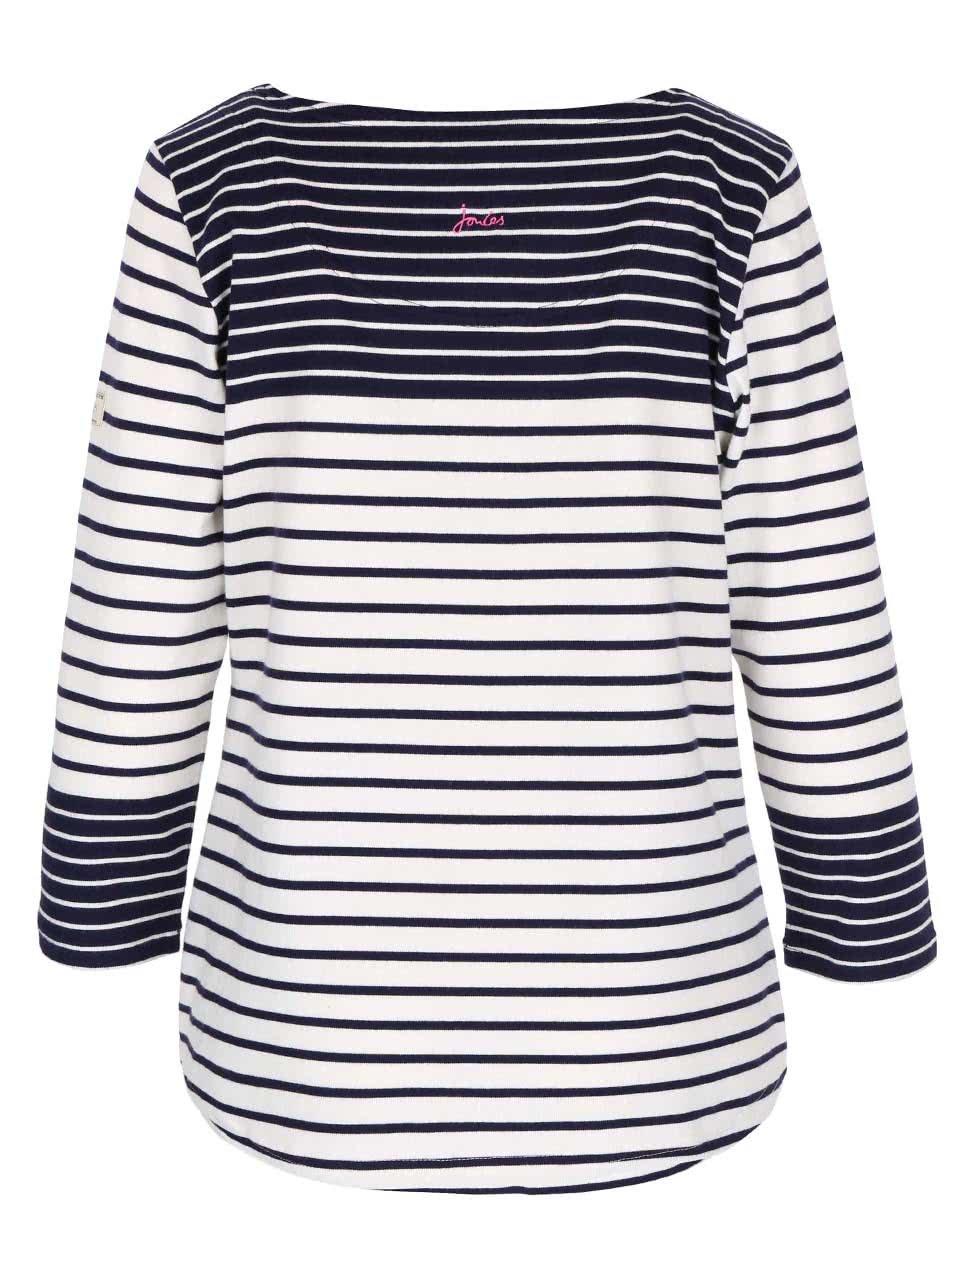 d775c0c7c5 Modro-biele dámske pruhované tričko s dlhým rukávom Tom Joule Harbour ...